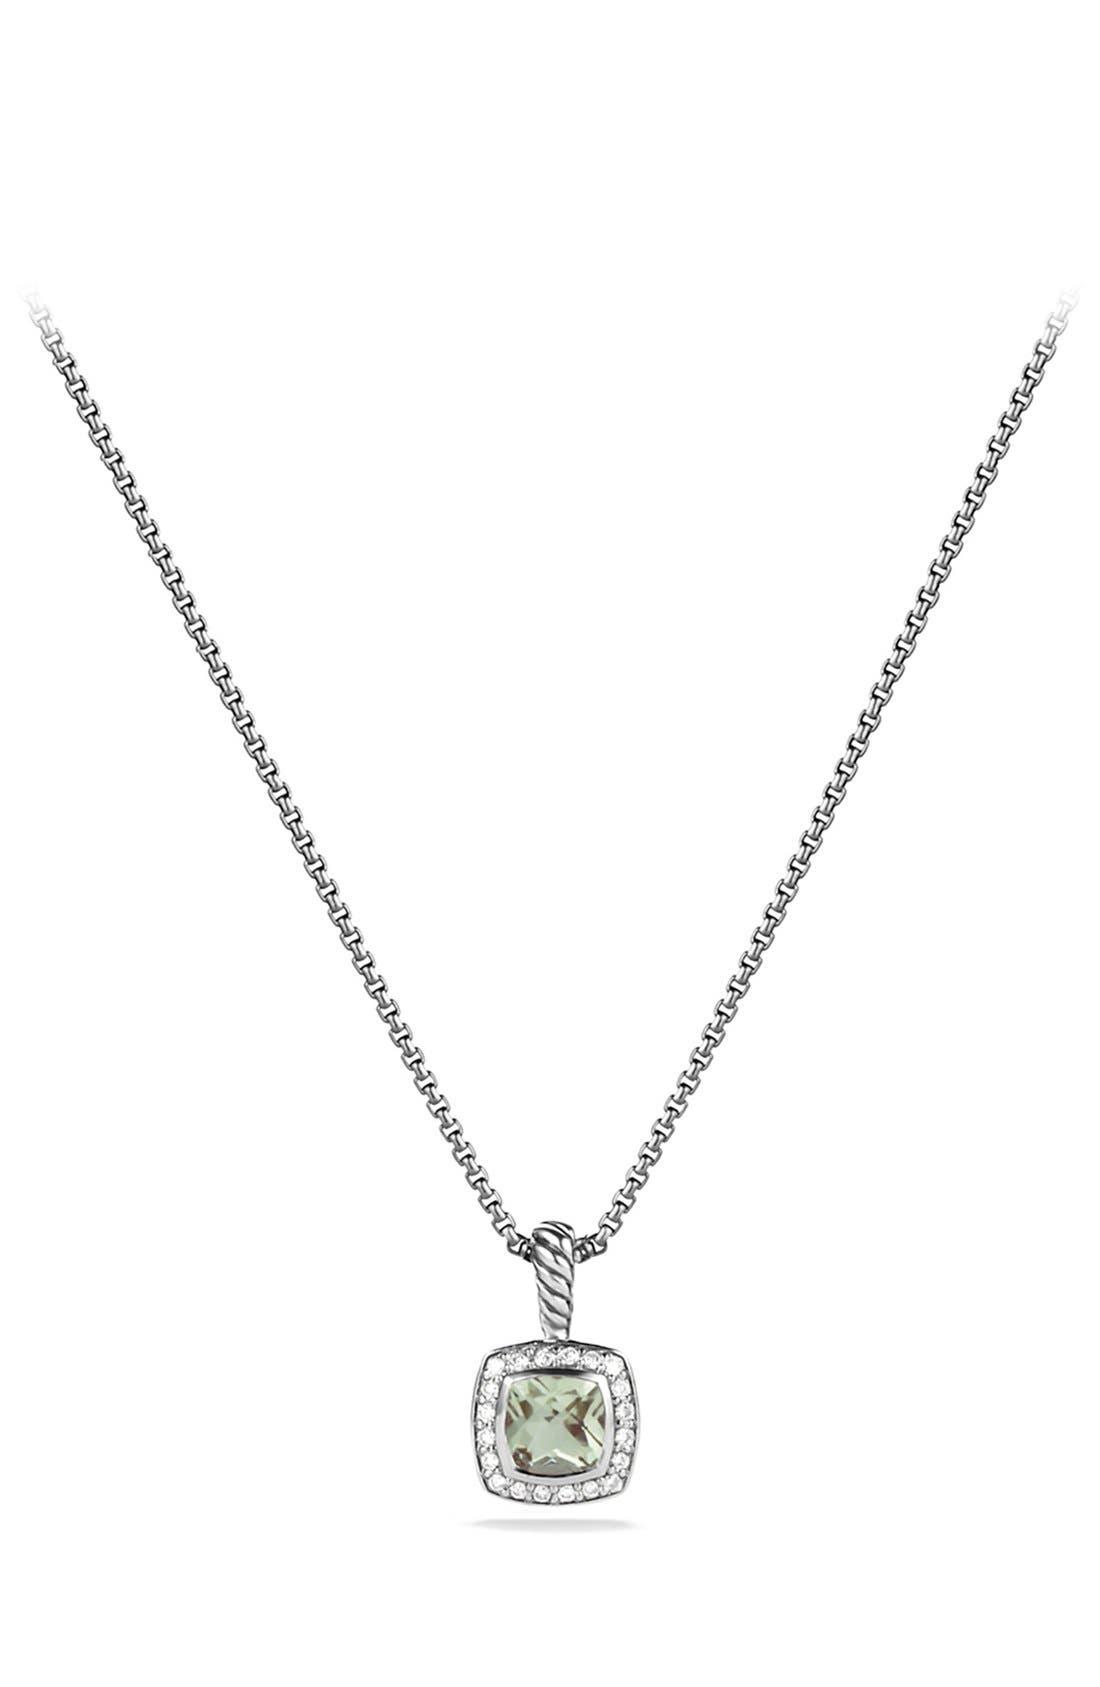 'Albion' Petite Pendant with Prasiolite and Diamonds on Chain,                             Main thumbnail 1, color,                             PRASIOLITE